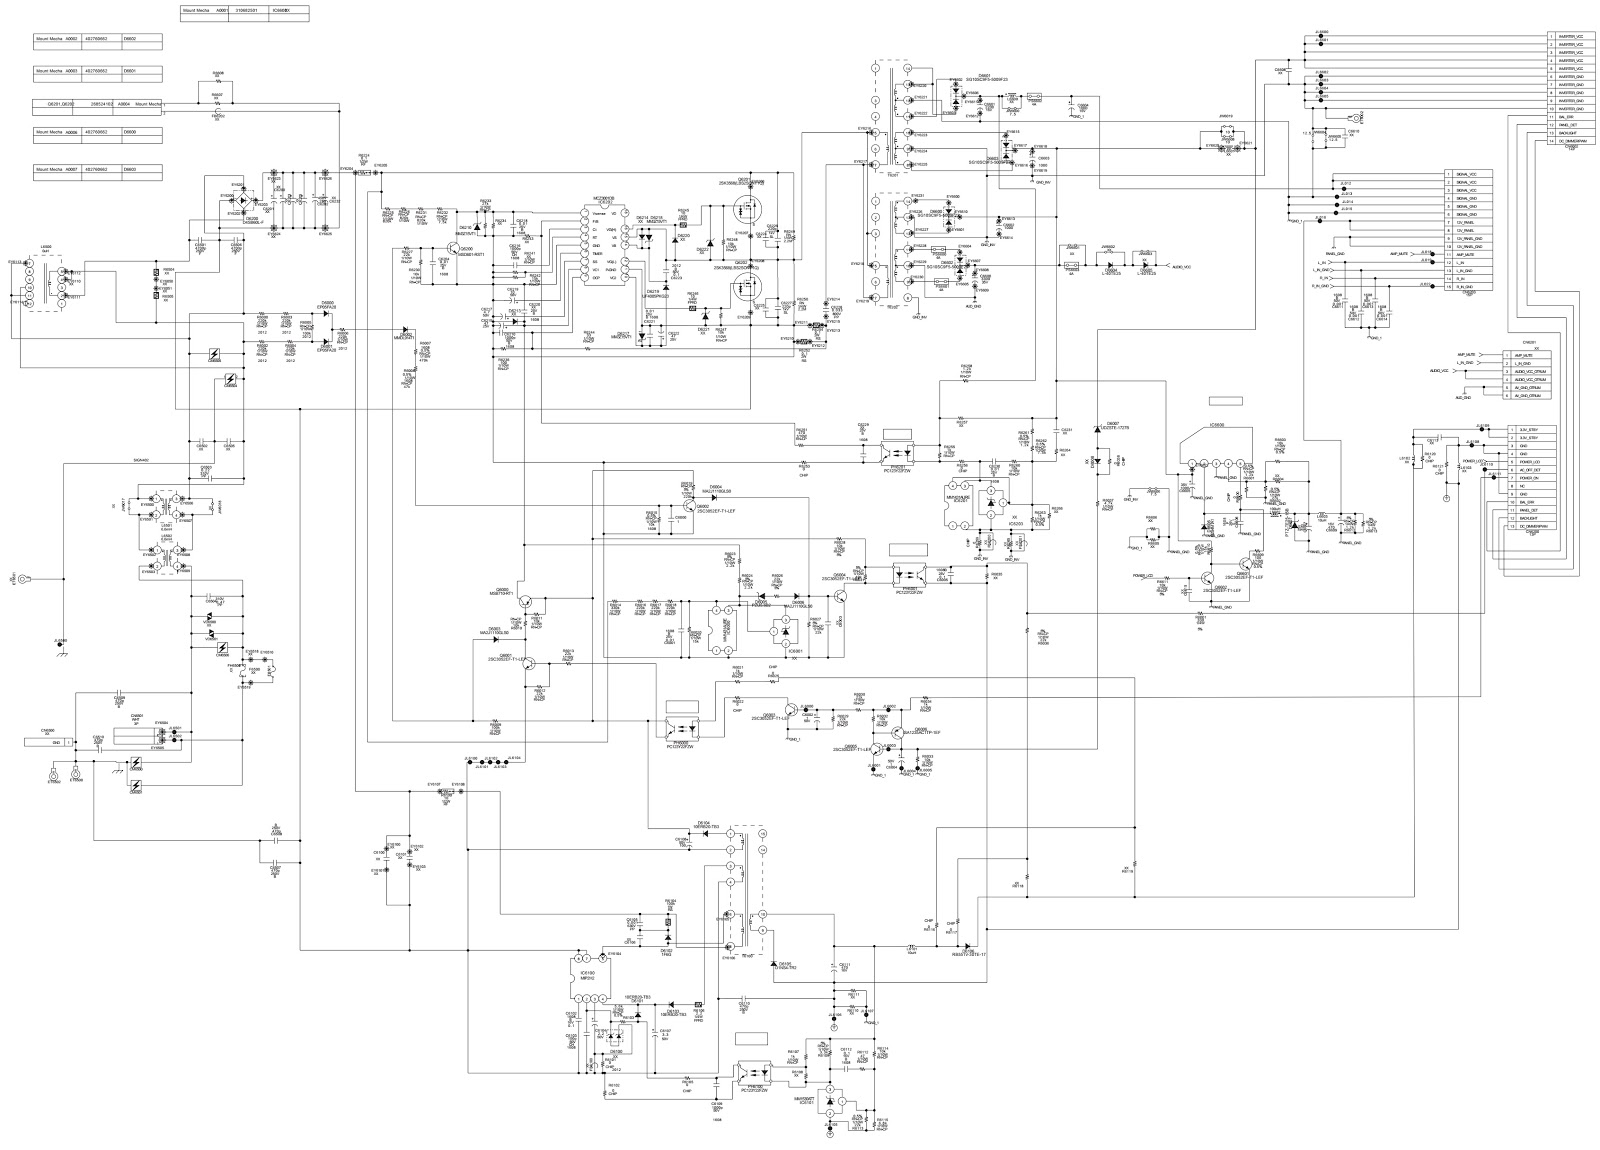 Sony Tv Circuit Diagram - Auto Electrical Wiring Diagram •